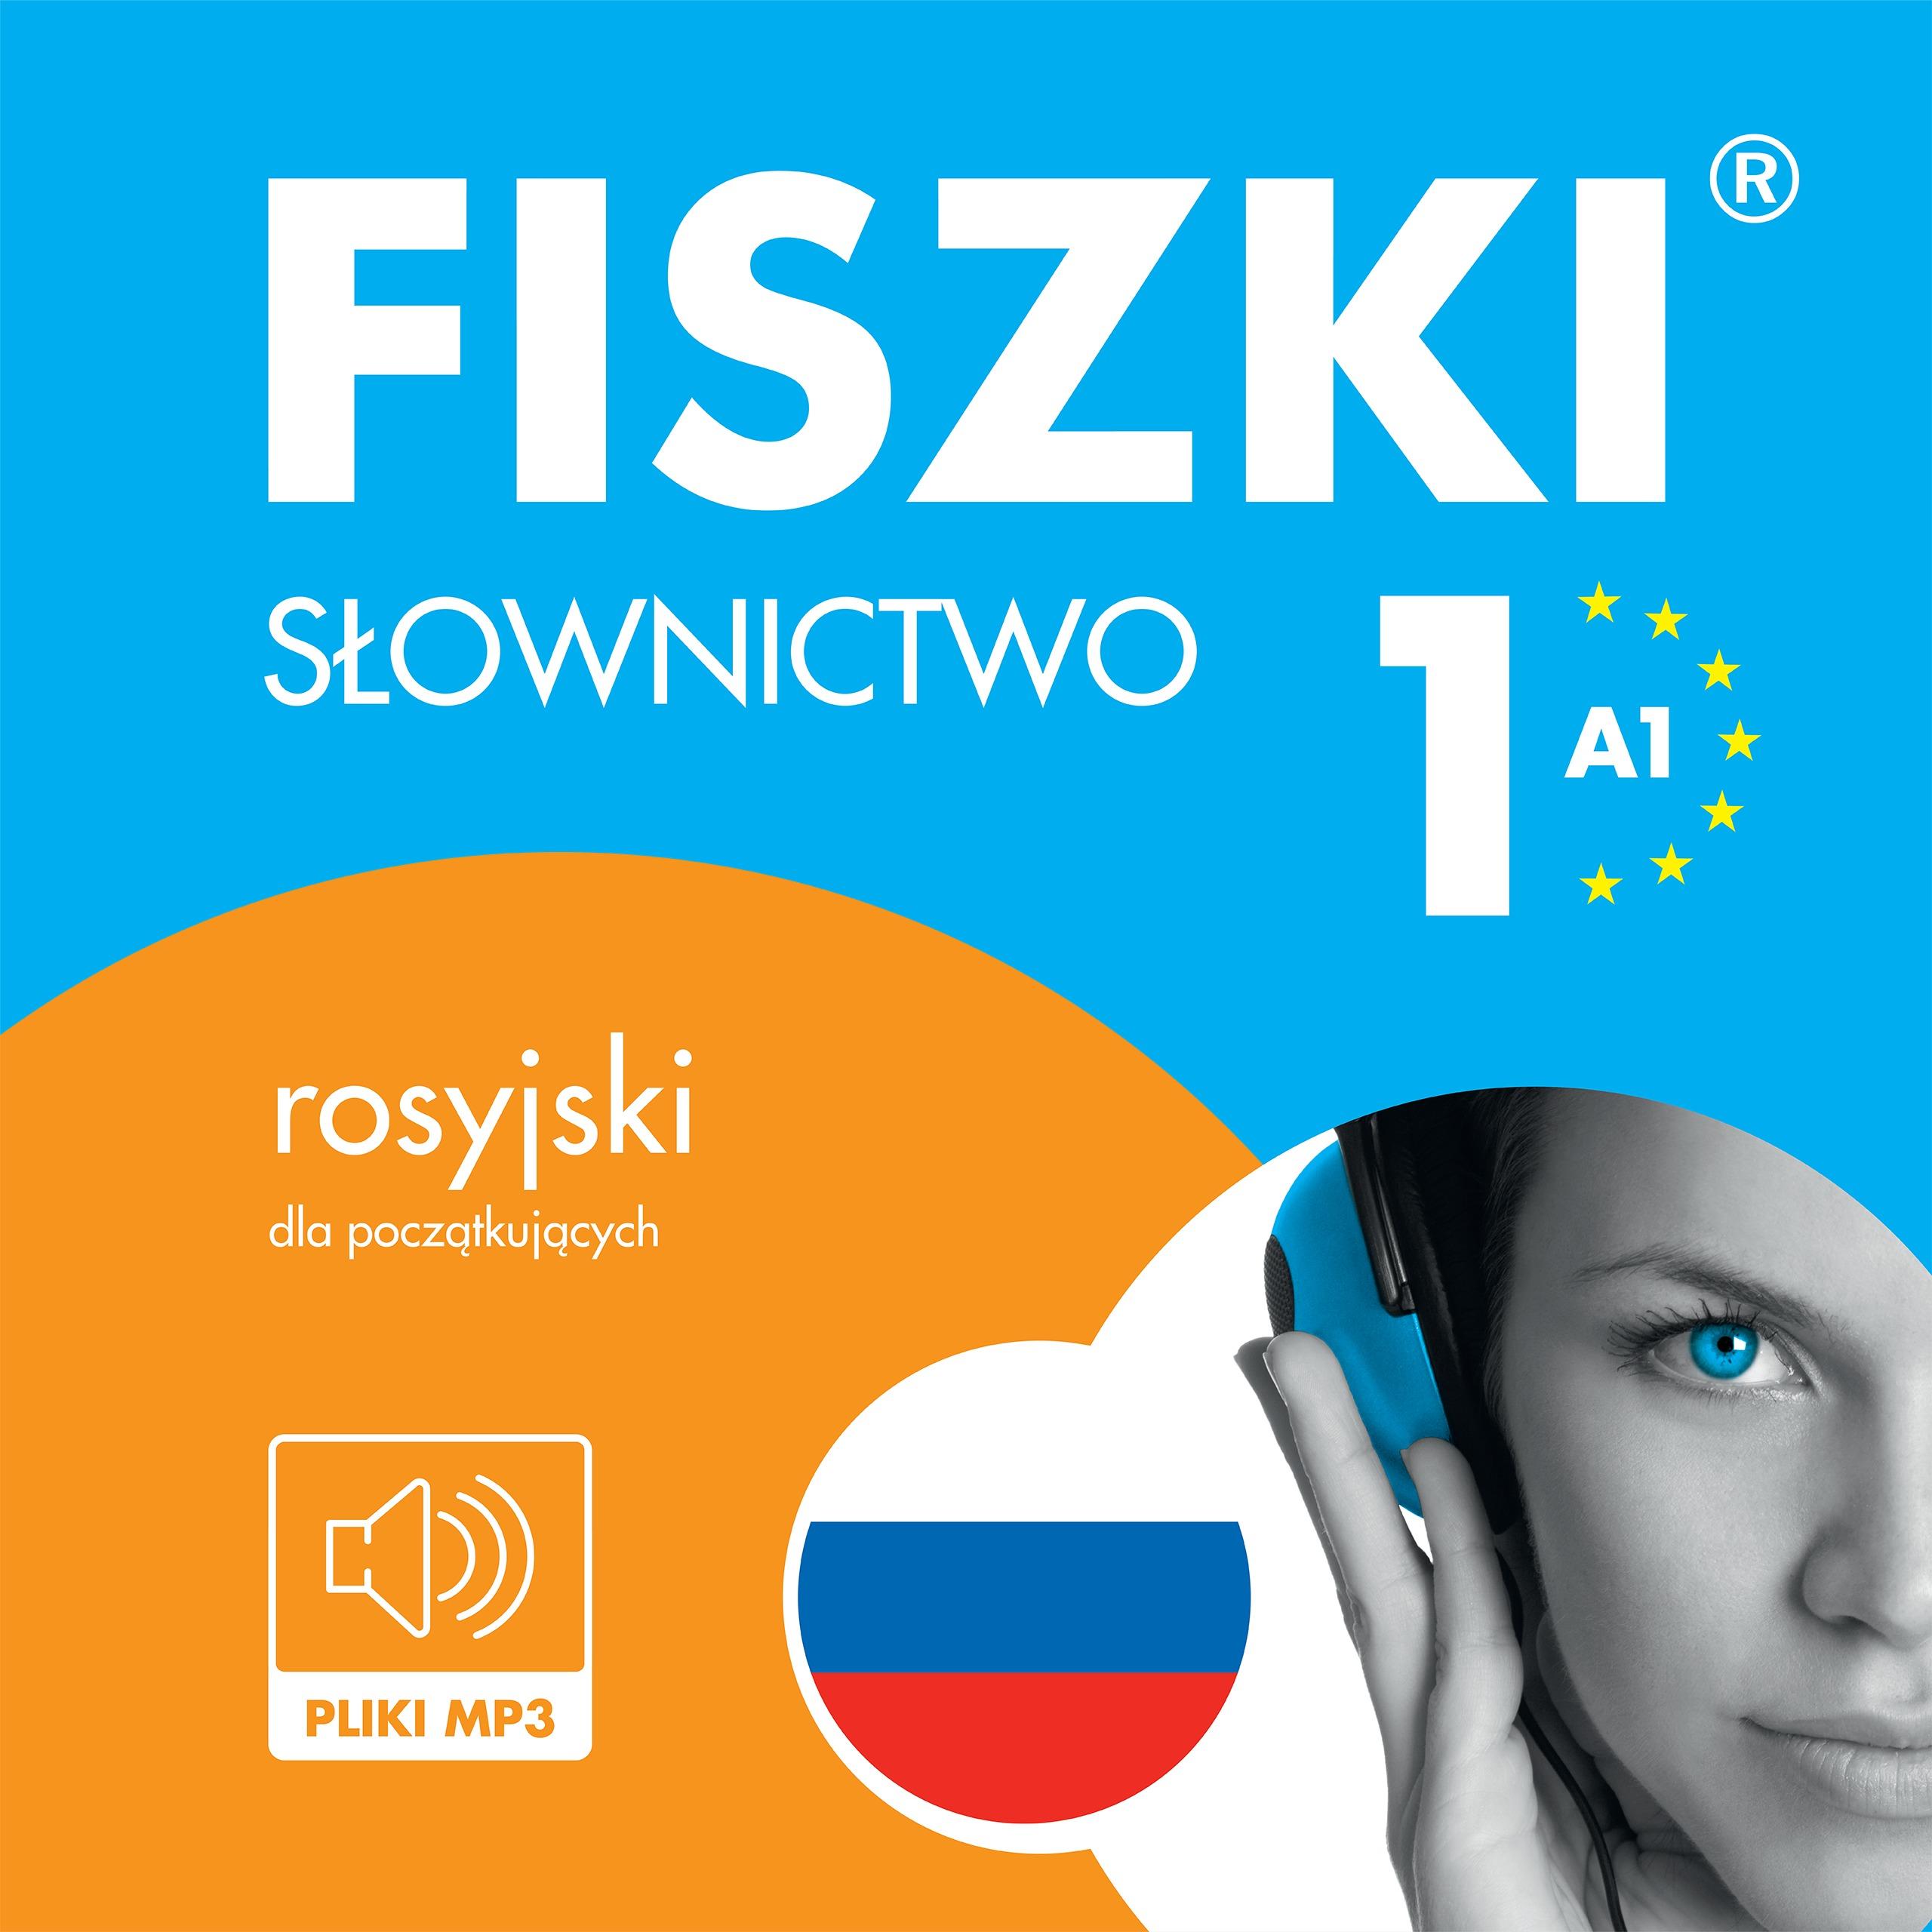 AUDIOBOOK - rosyjski - Słownictwo 1 (A1)